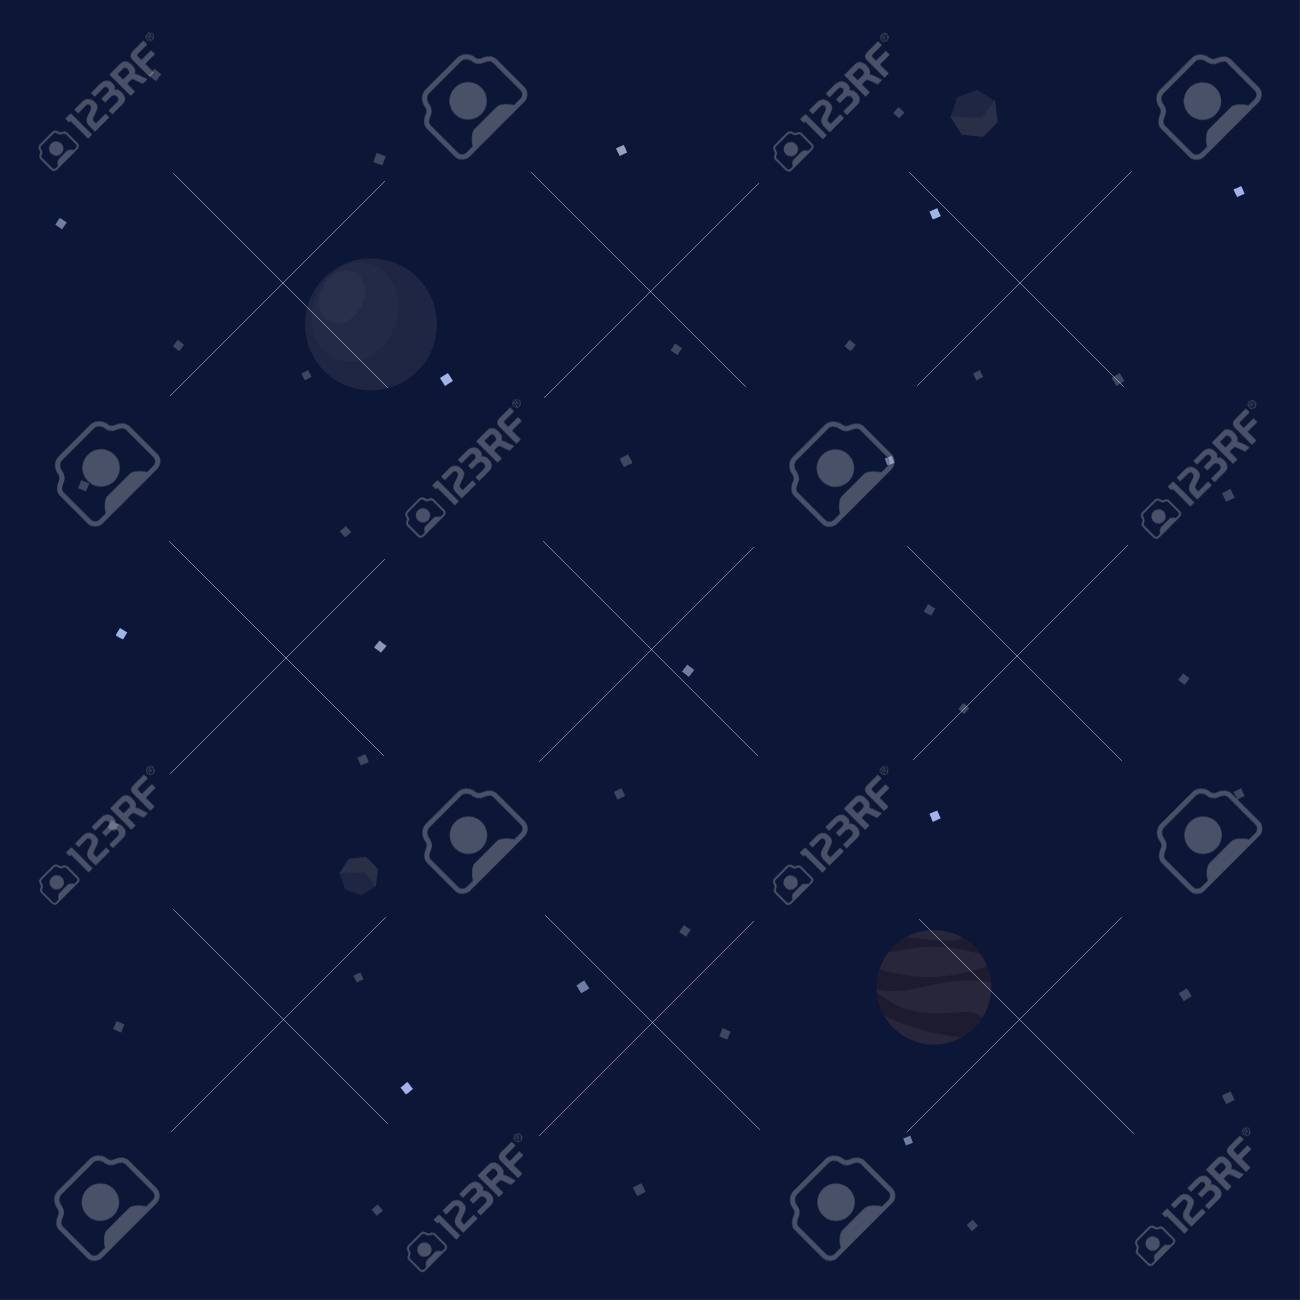 Rocket icons - 69017558